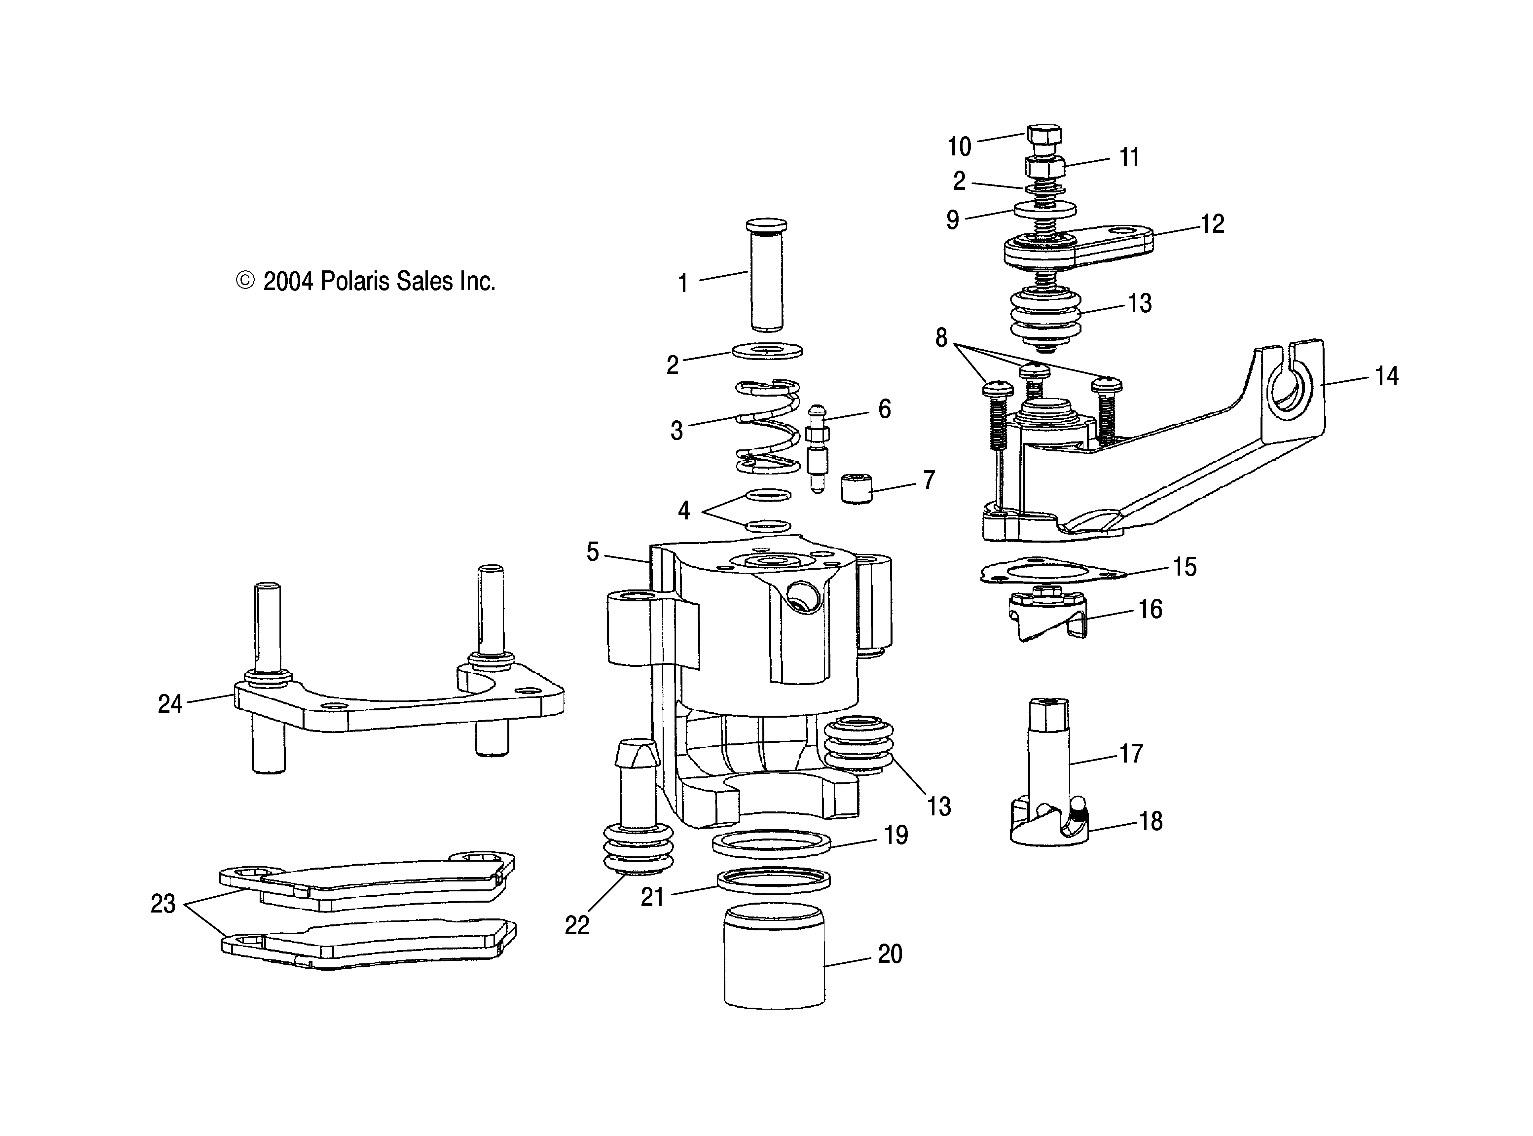 Polaris Ranger Parts Diagram Wheel Electrical Wiring Diagrams Illustrates The 2010 Atv Sportsman 800 Parking Brake House Symbols U2022 Schematics